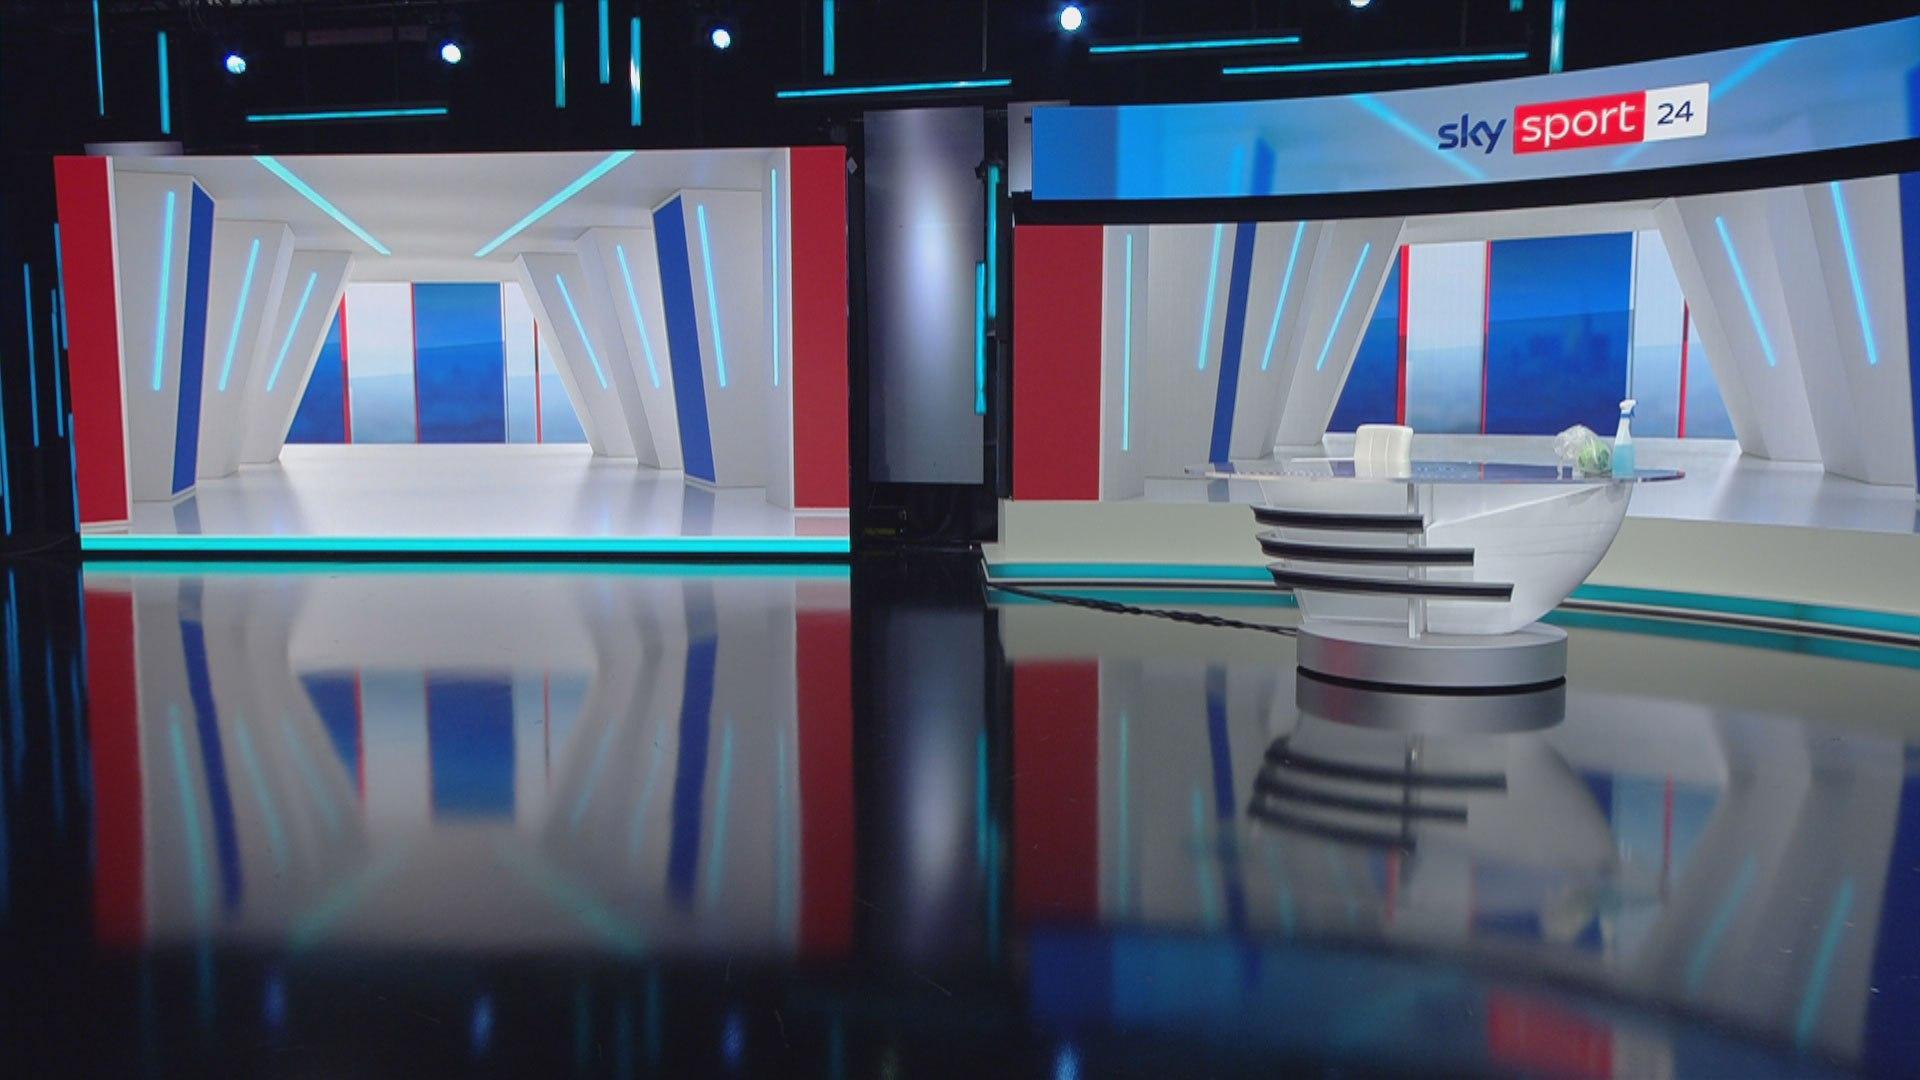 Sky Sport24 TG Ultima Parola